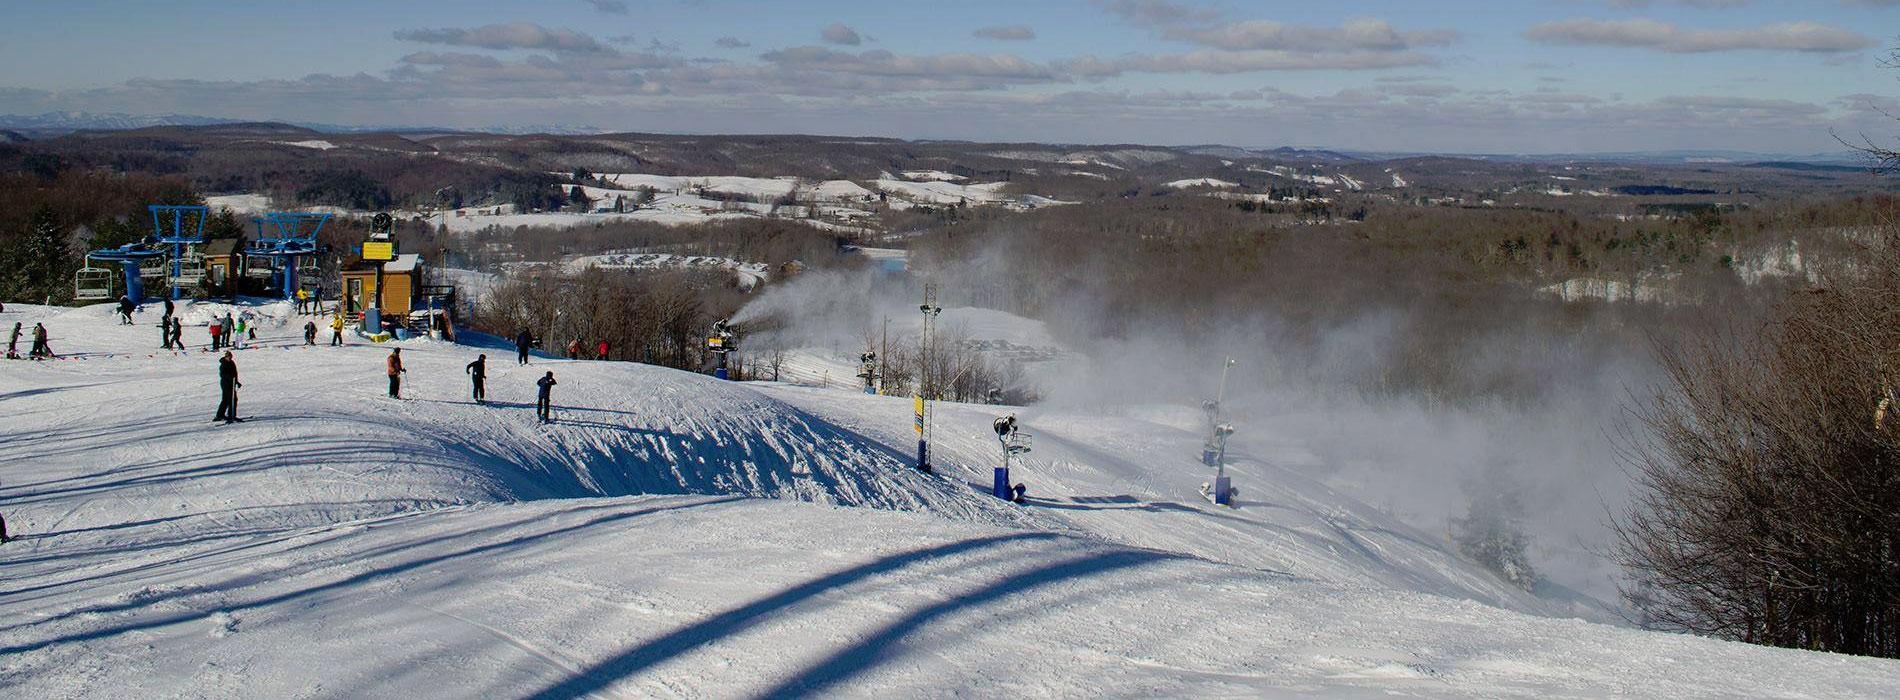 winterplace ski resort - high country weather